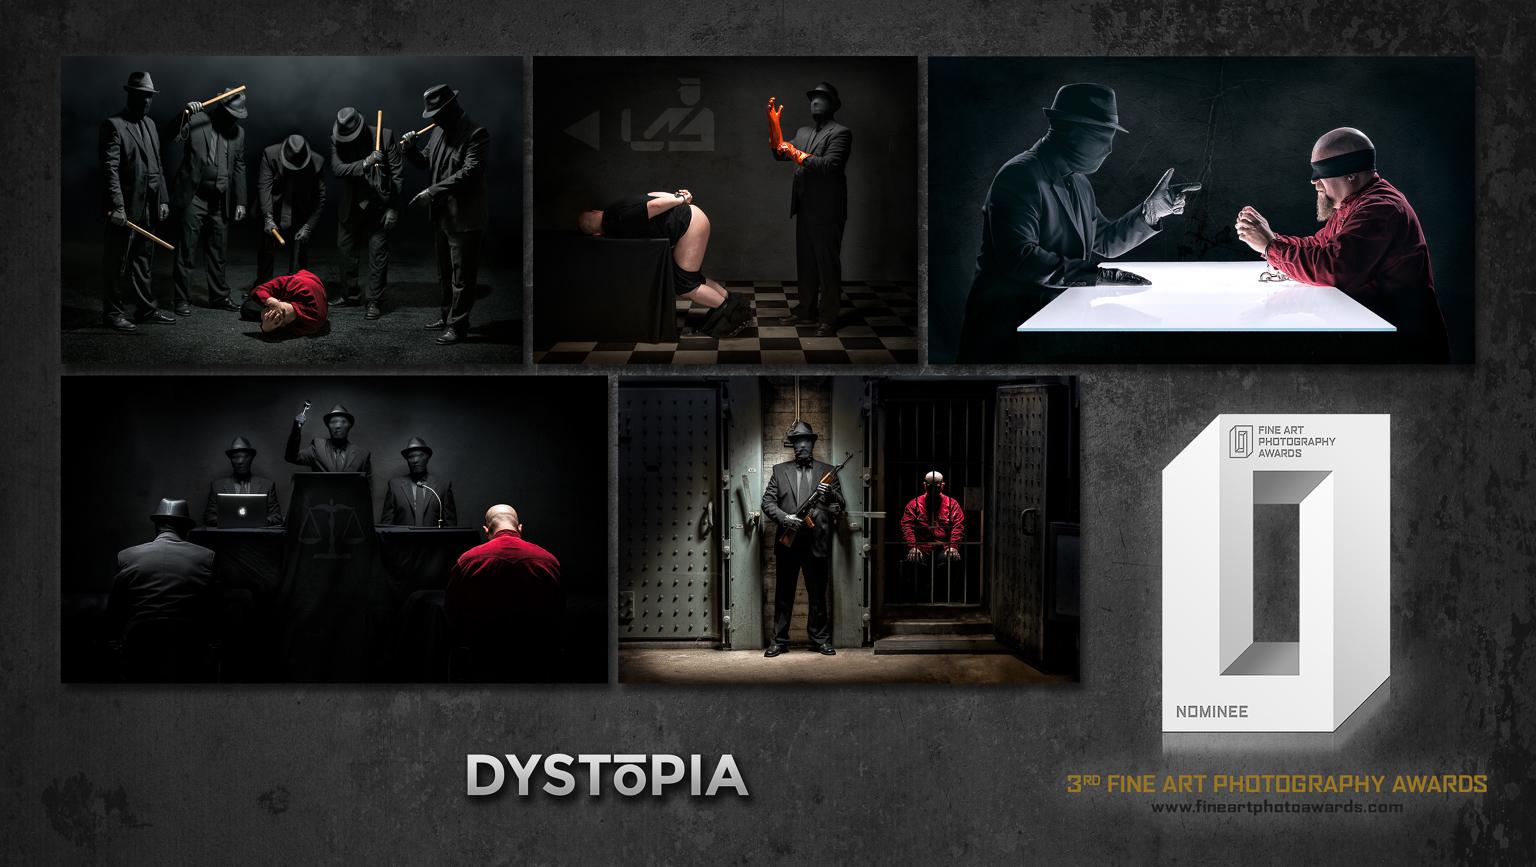 3rd Fine Art Photography Awards Petri Damsten